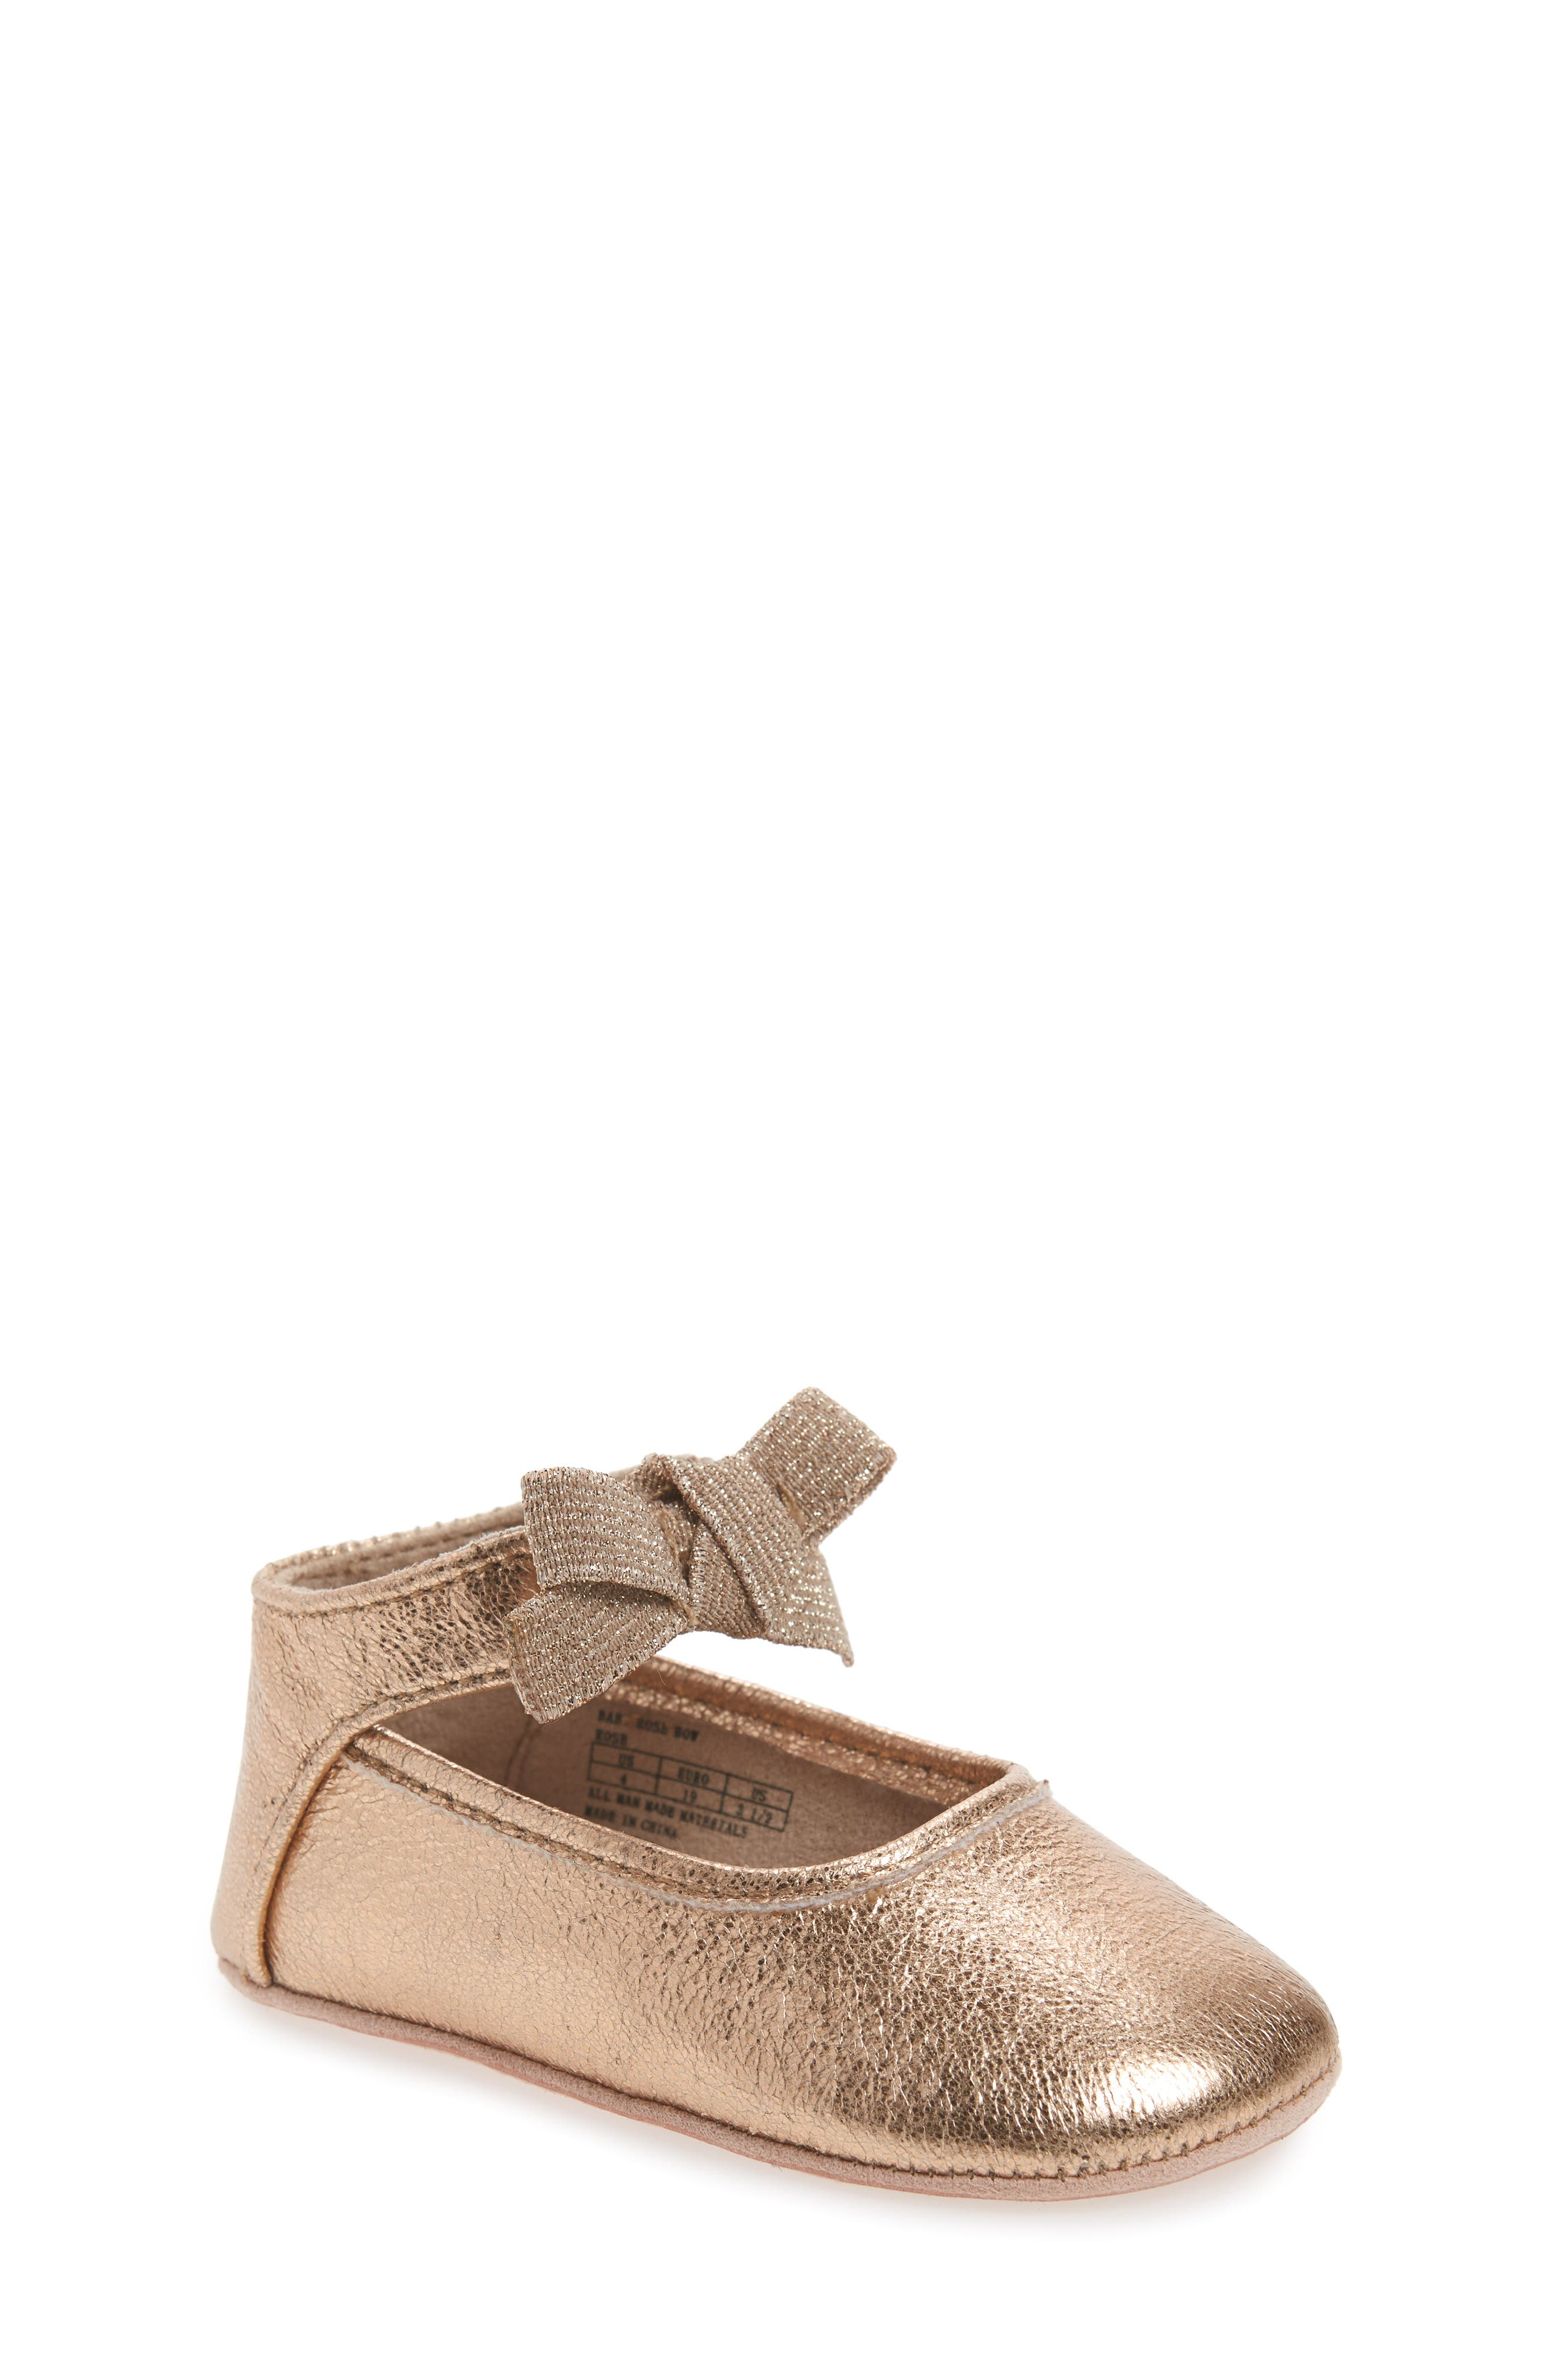 Rose Bow Metallic Ballet Flat,                             Main thumbnail 1, color,                             ROSE